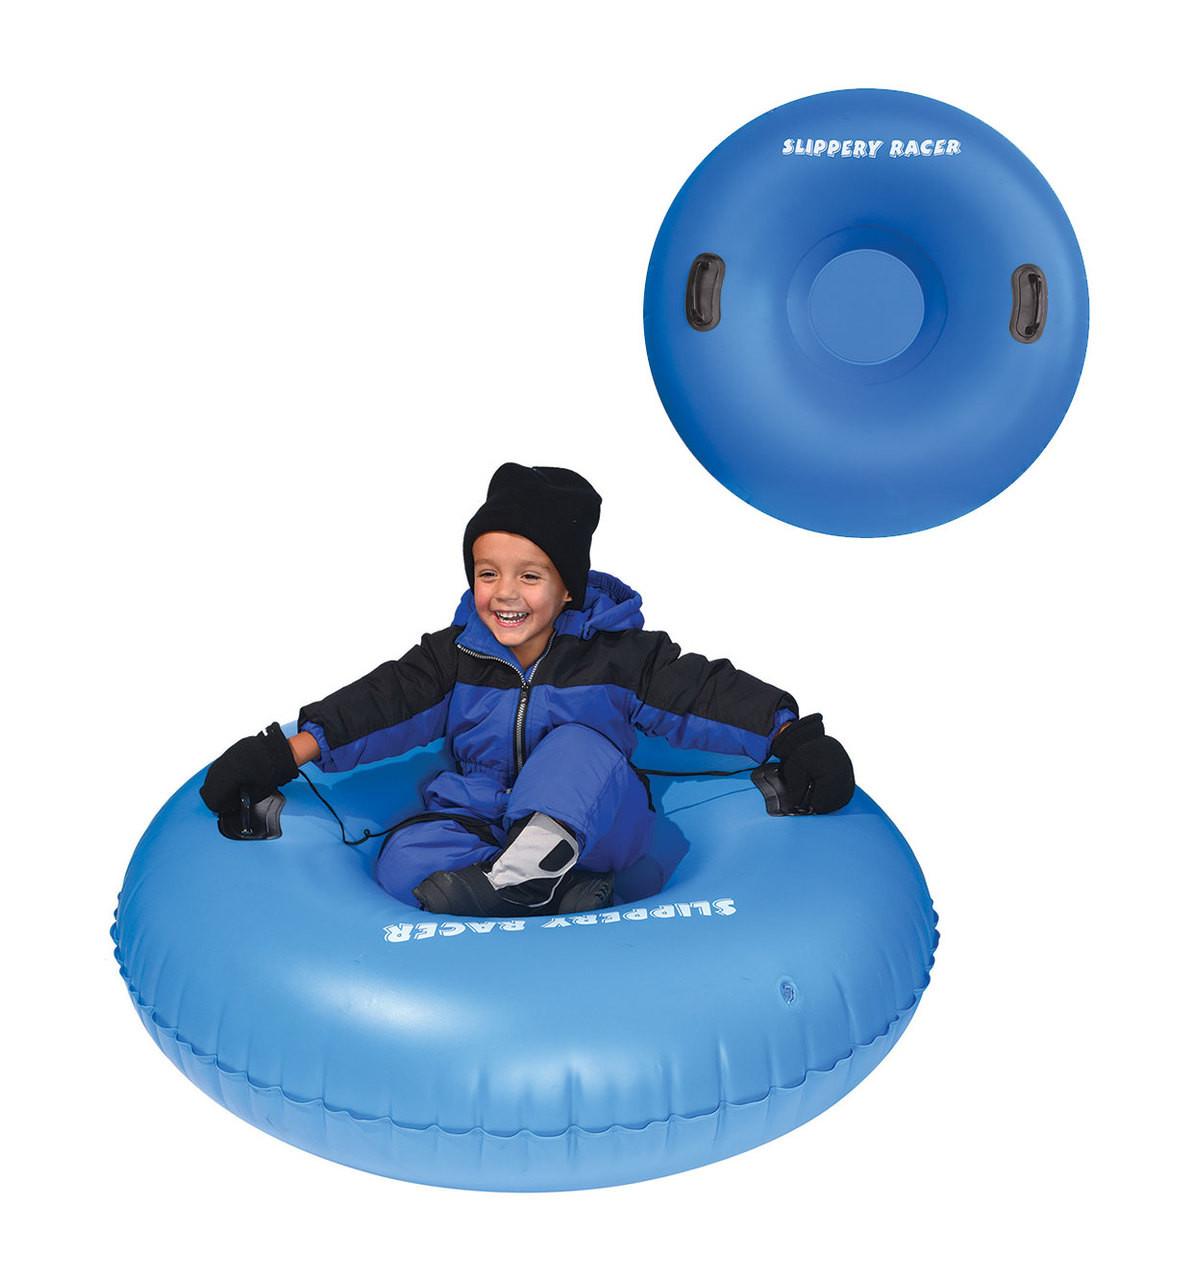 BLUE Slippery Racer Grande XL Commercial Inflatable Snow Tube Sled